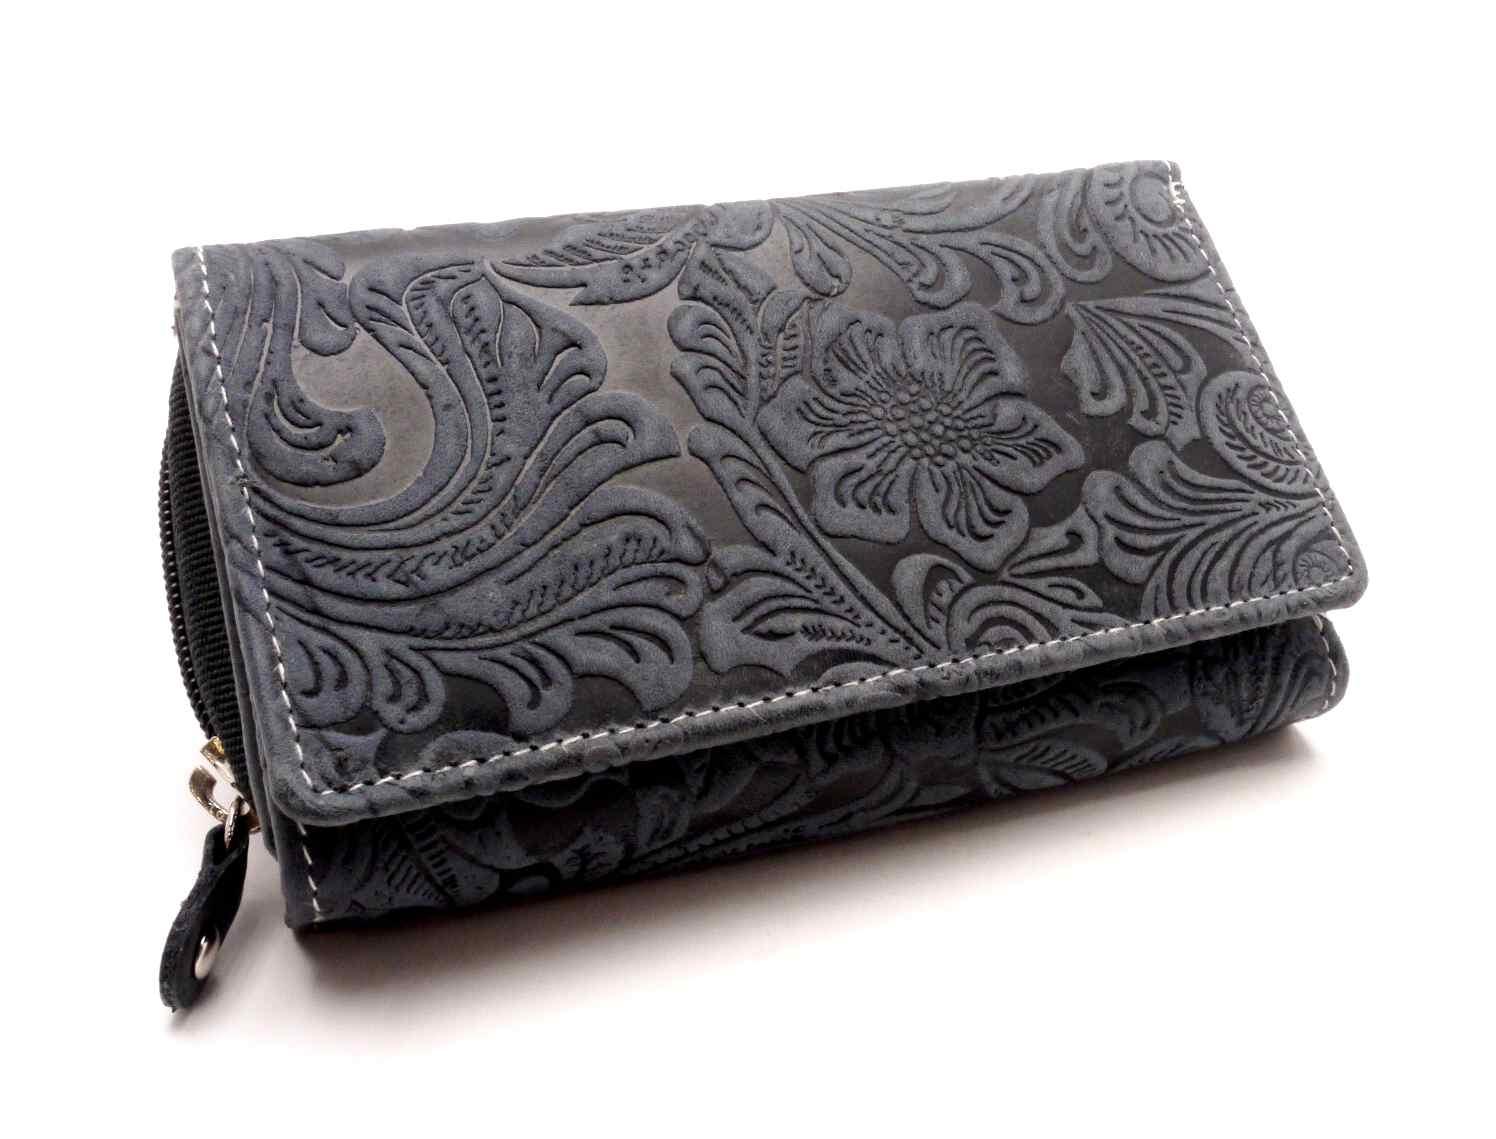 Anekta Dámská peněženka s ornamenty D41-36 DARK BLUE